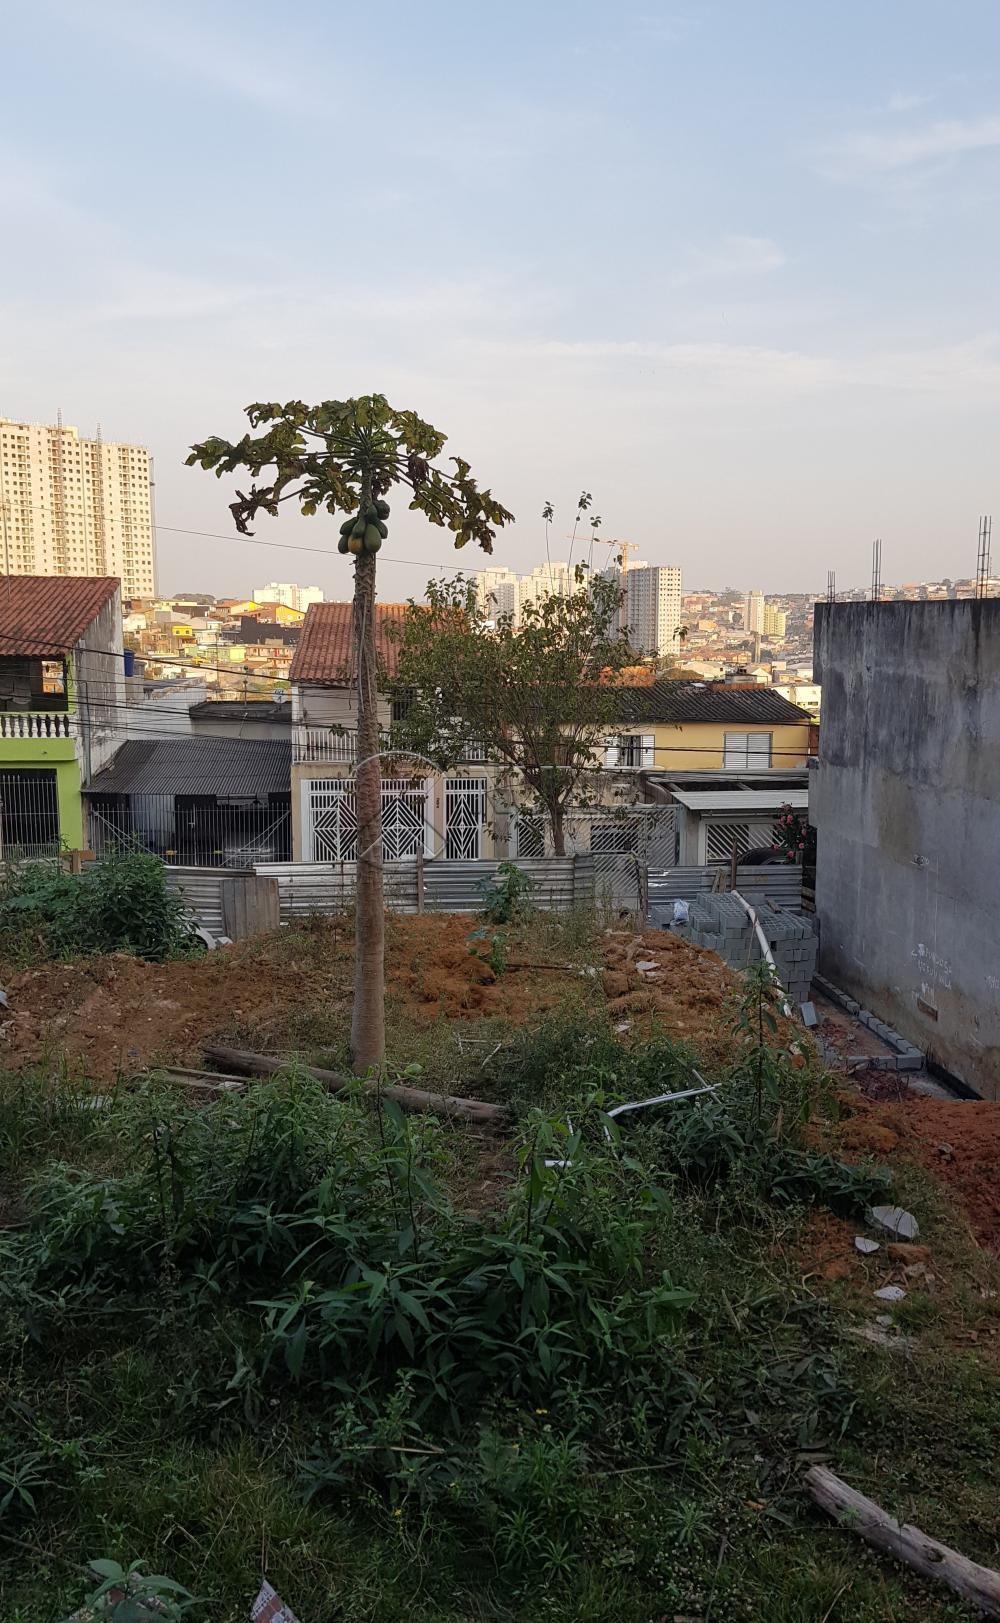 Comprar Terreno / Terreno em Osasco apenas R$ 165.000,00 - Foto 6